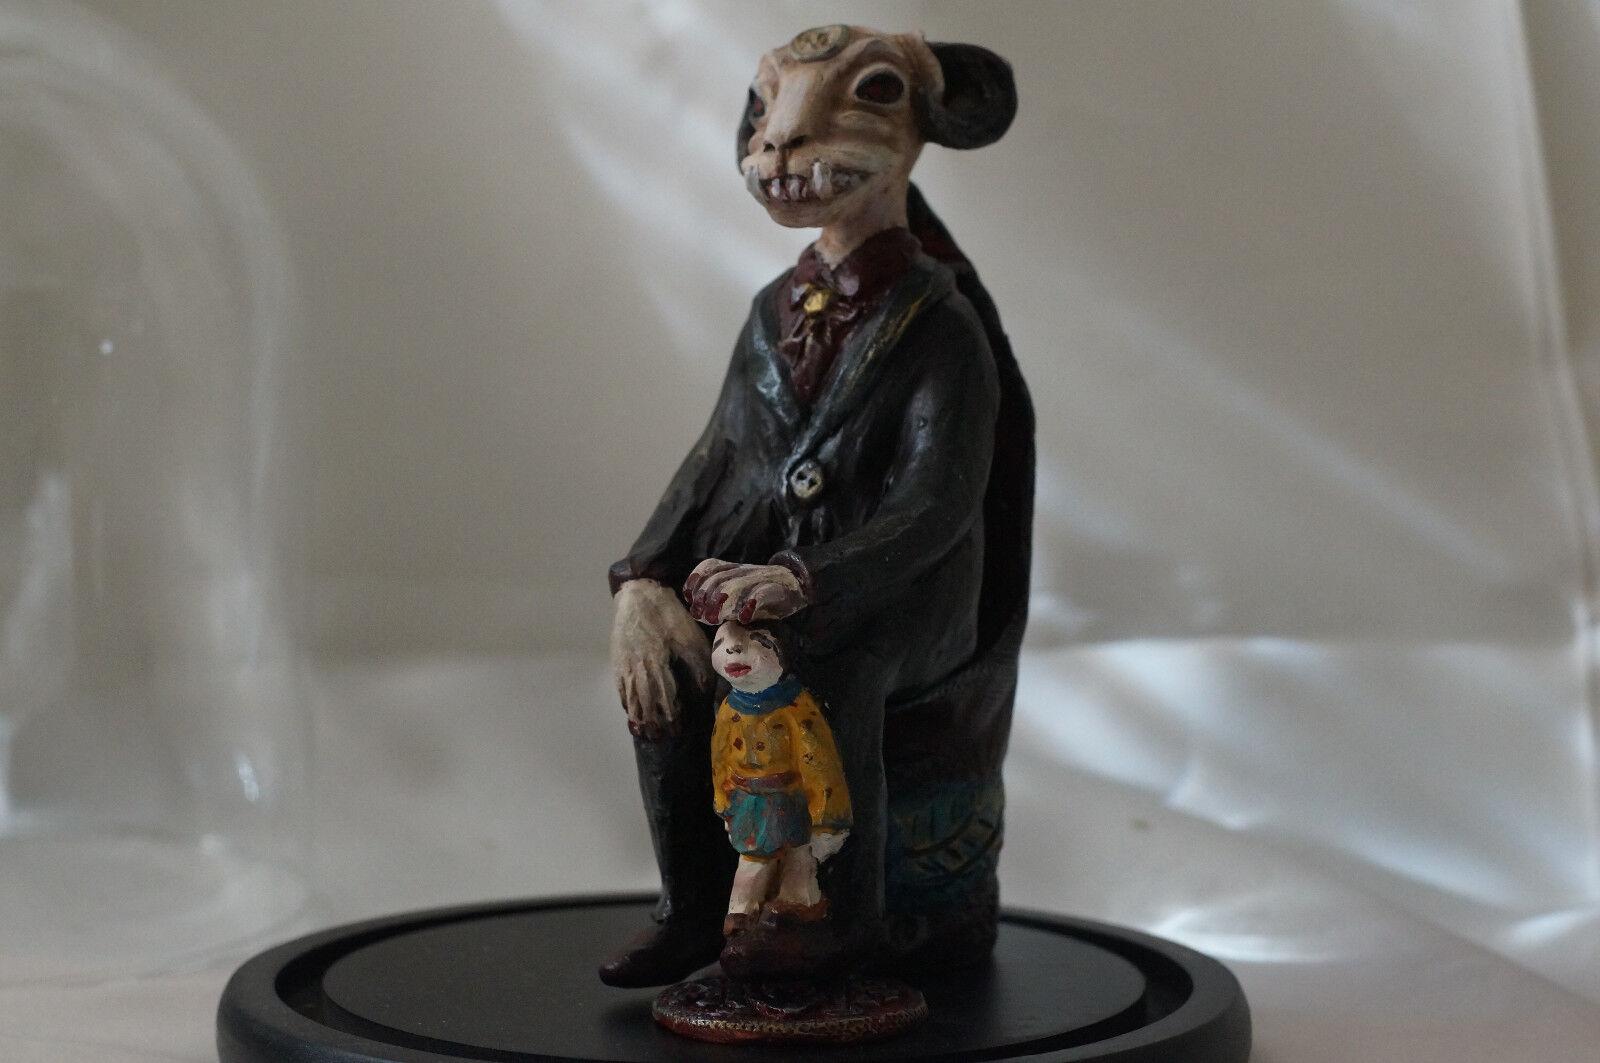 OOAK  Aka Manah  Demon Fantasy Figure Sculpture Polymer Clay Art Doll